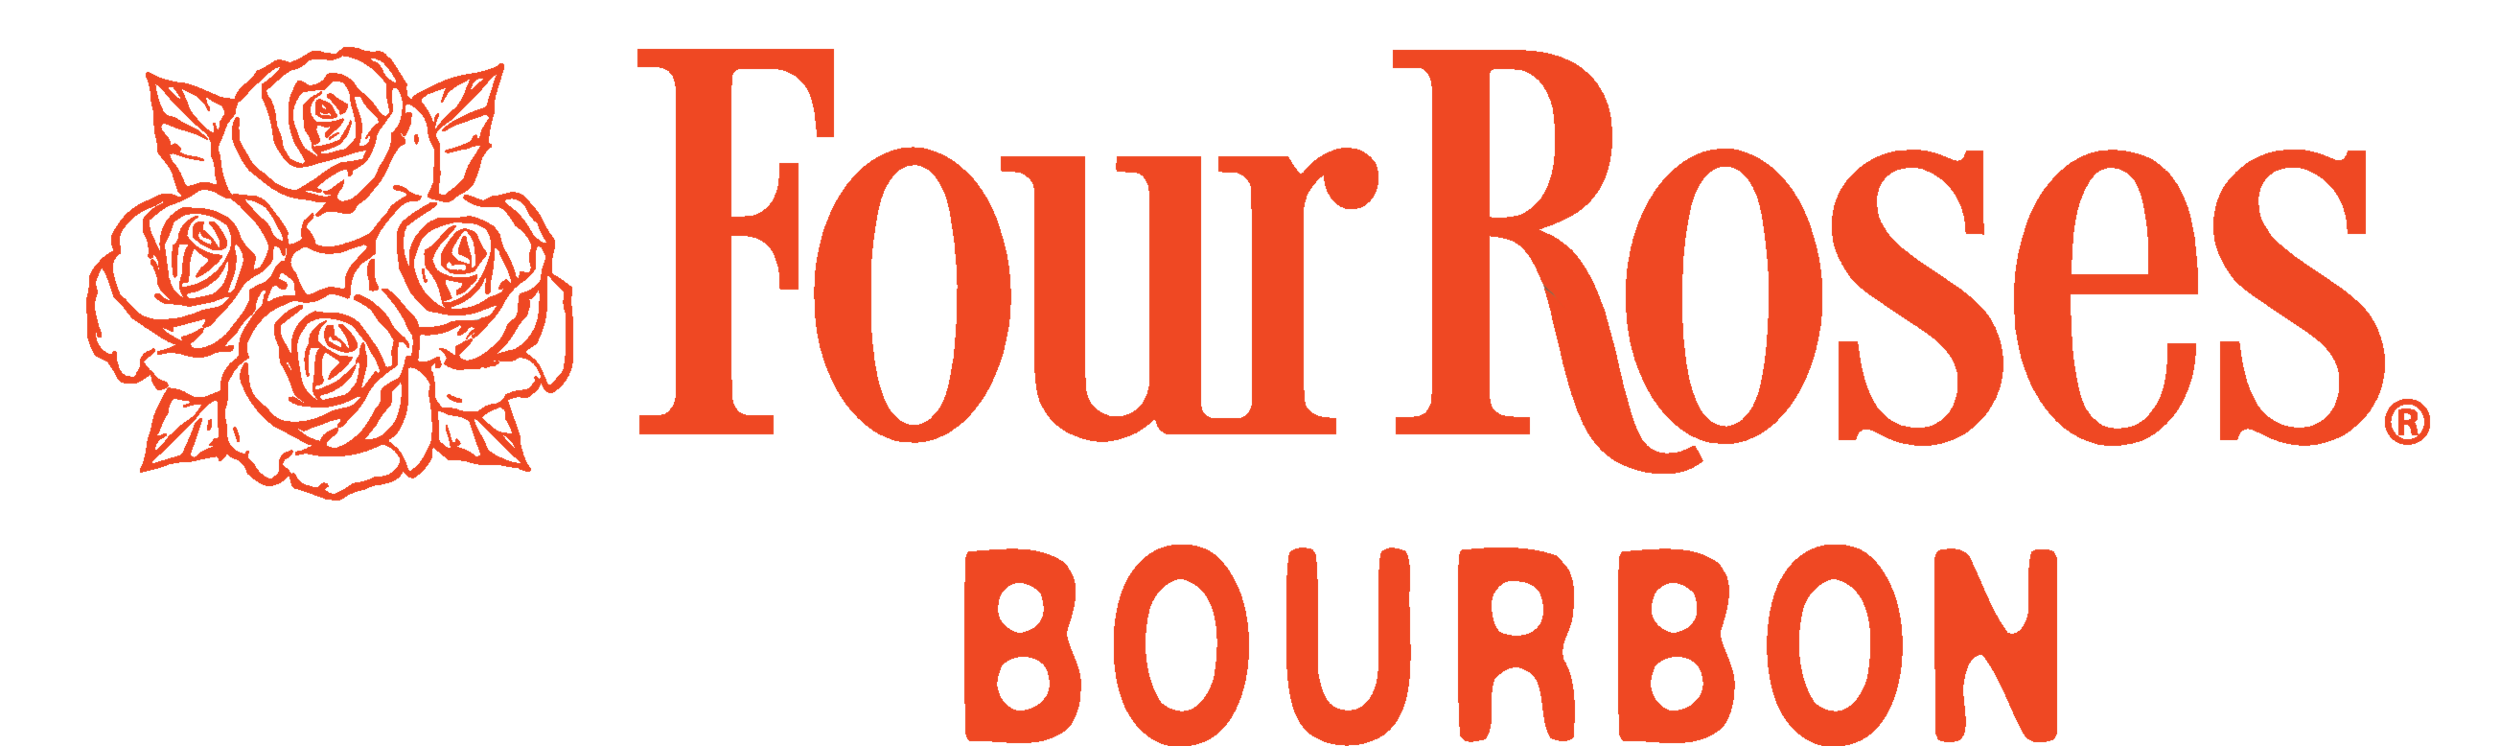 11 FourRoses Logo 11.png